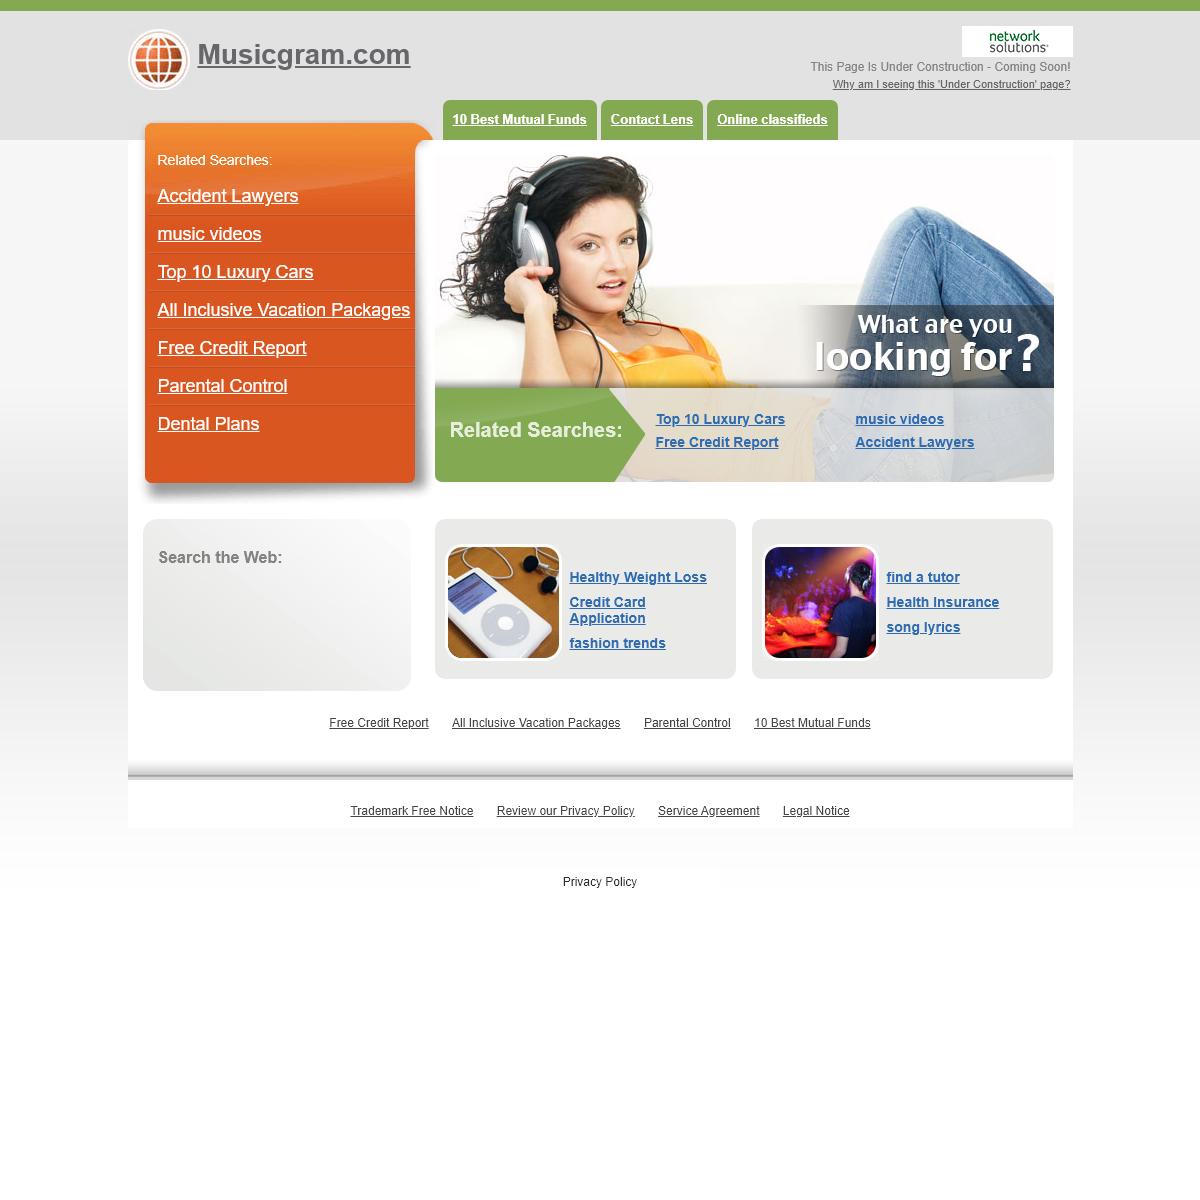 Musicgram.com